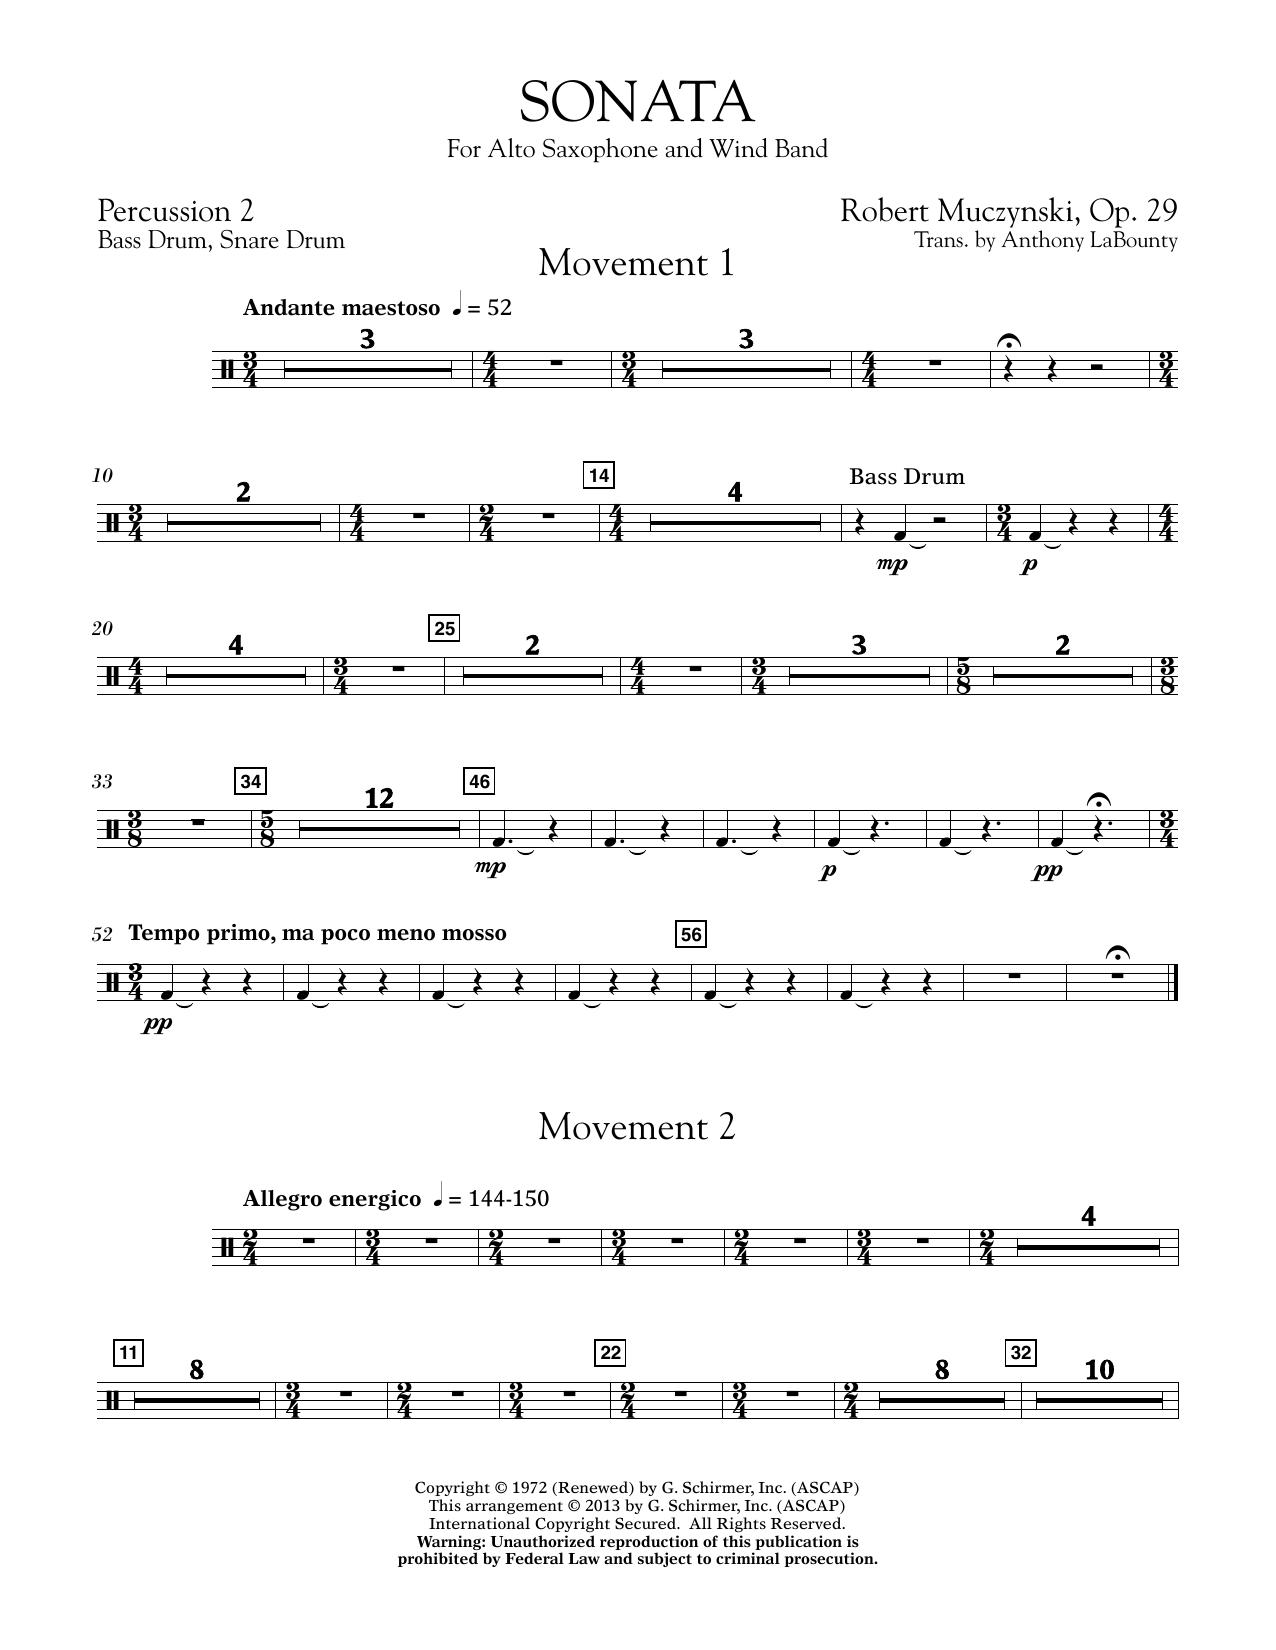 Sonata for Alto Saxophone, Op. 29 - Percussion 2 (Concert Band)